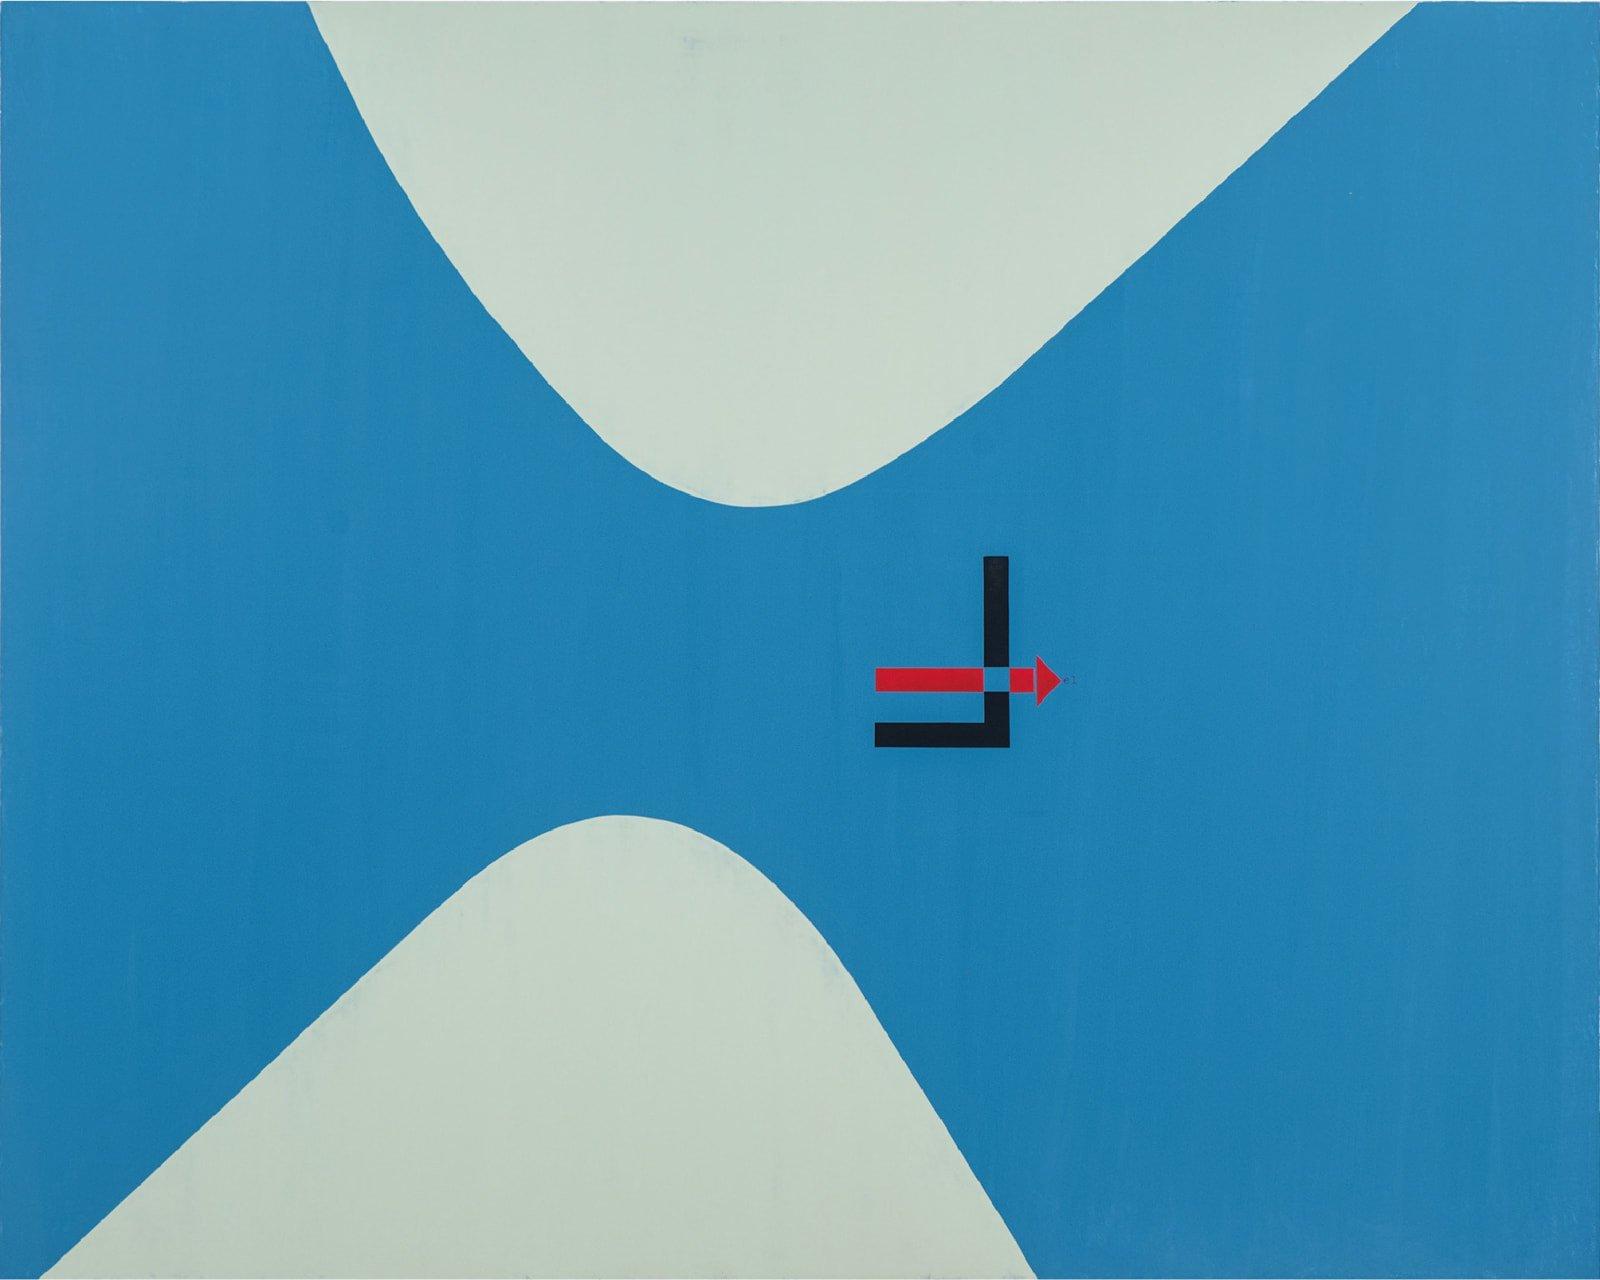 david-diao-el-lissitzky-monogram-2017